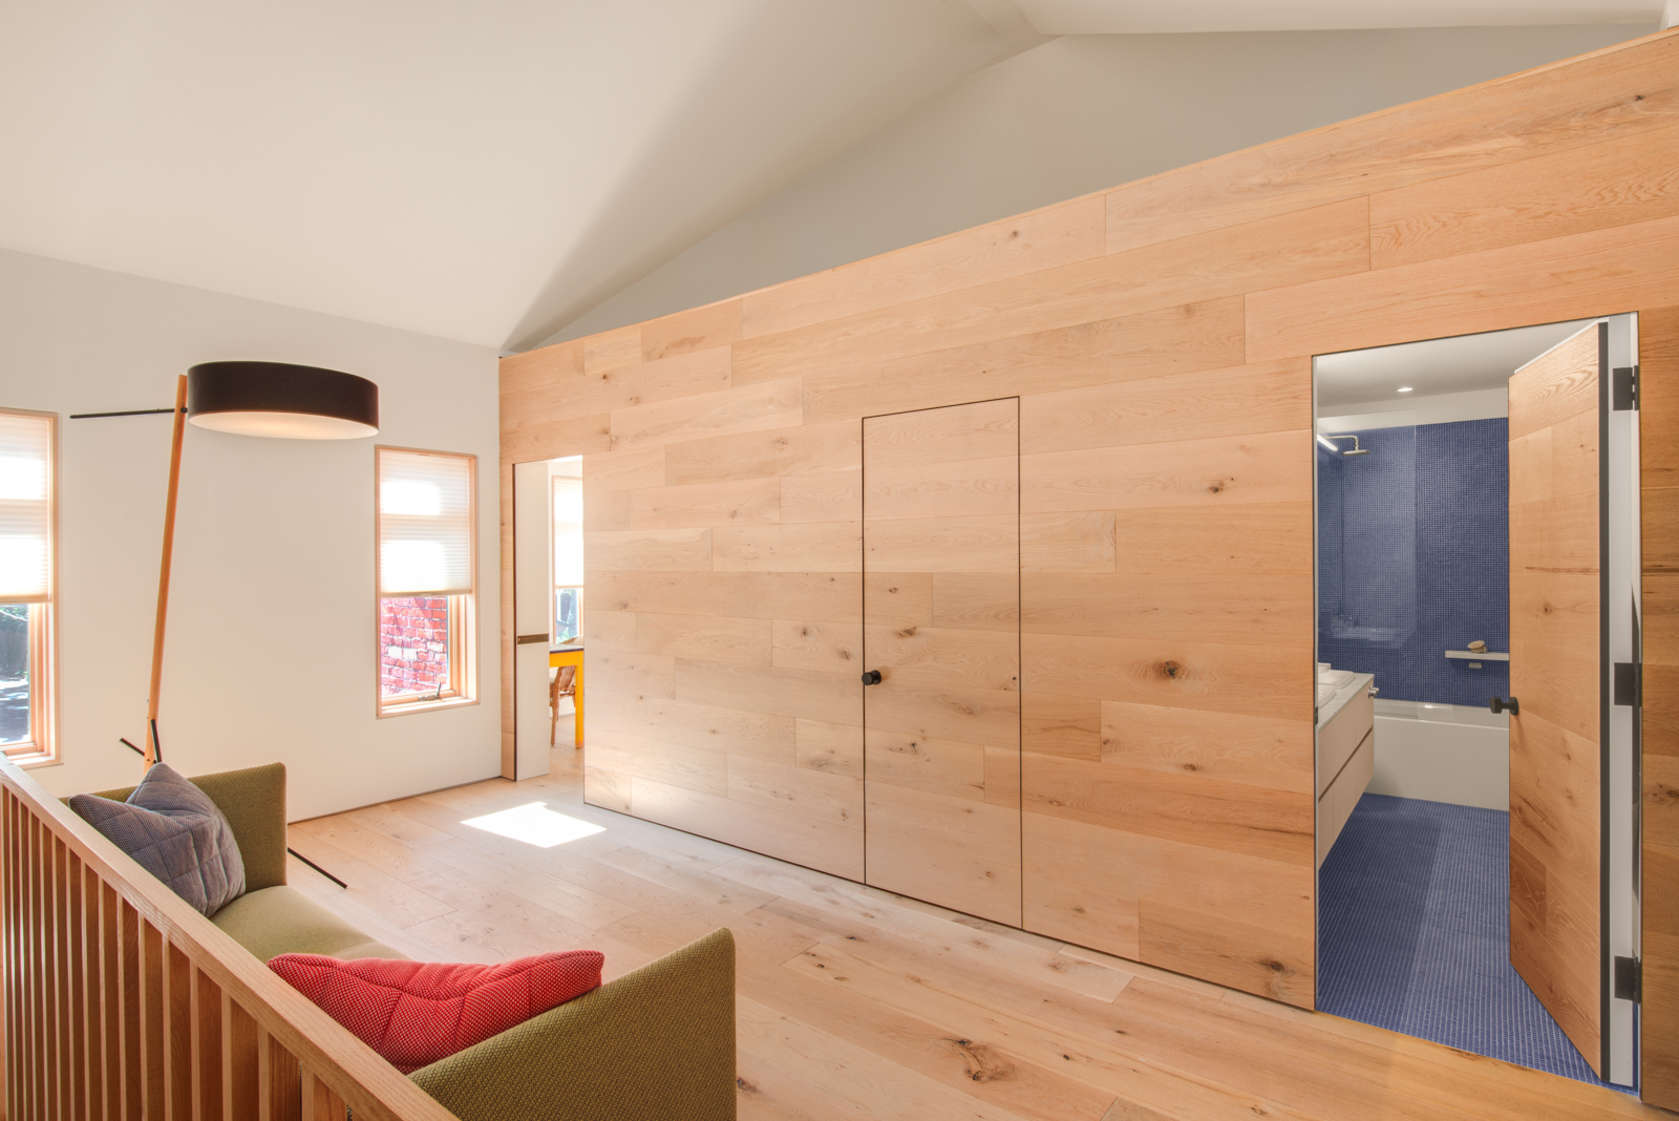 6-casa-no-canada-recebe-reforma-para-integrar-as-areas-comuns